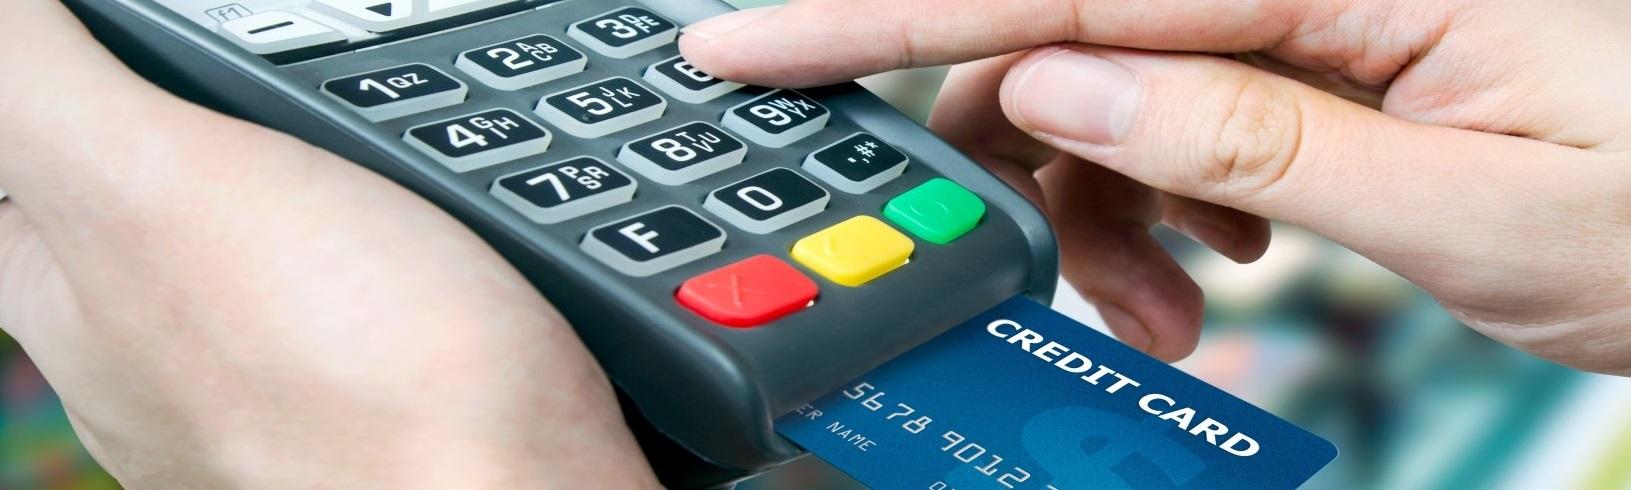 BASYS EMV card and terminal